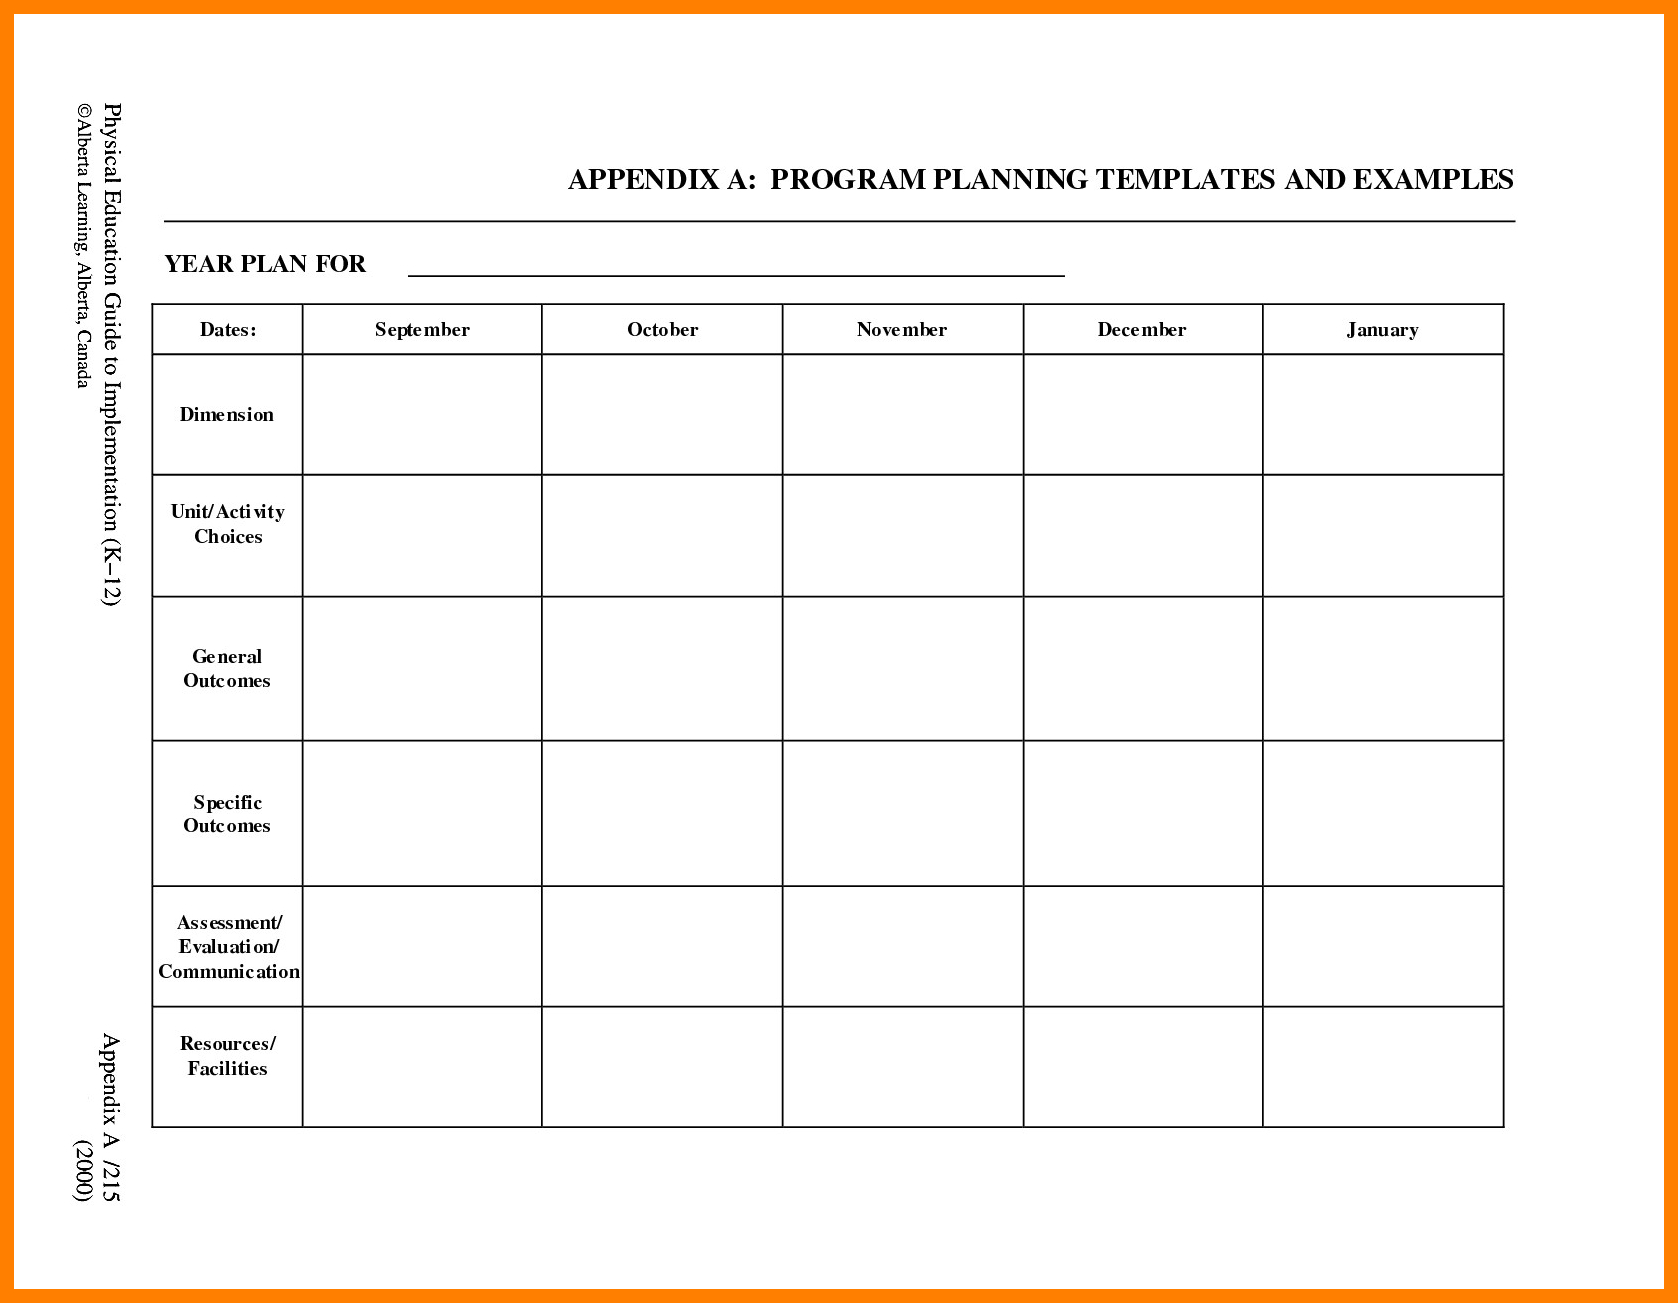 025 Free Printable Preschool Lesson Plan Template Blank For With - Free Printable Preschool Lesson Plans